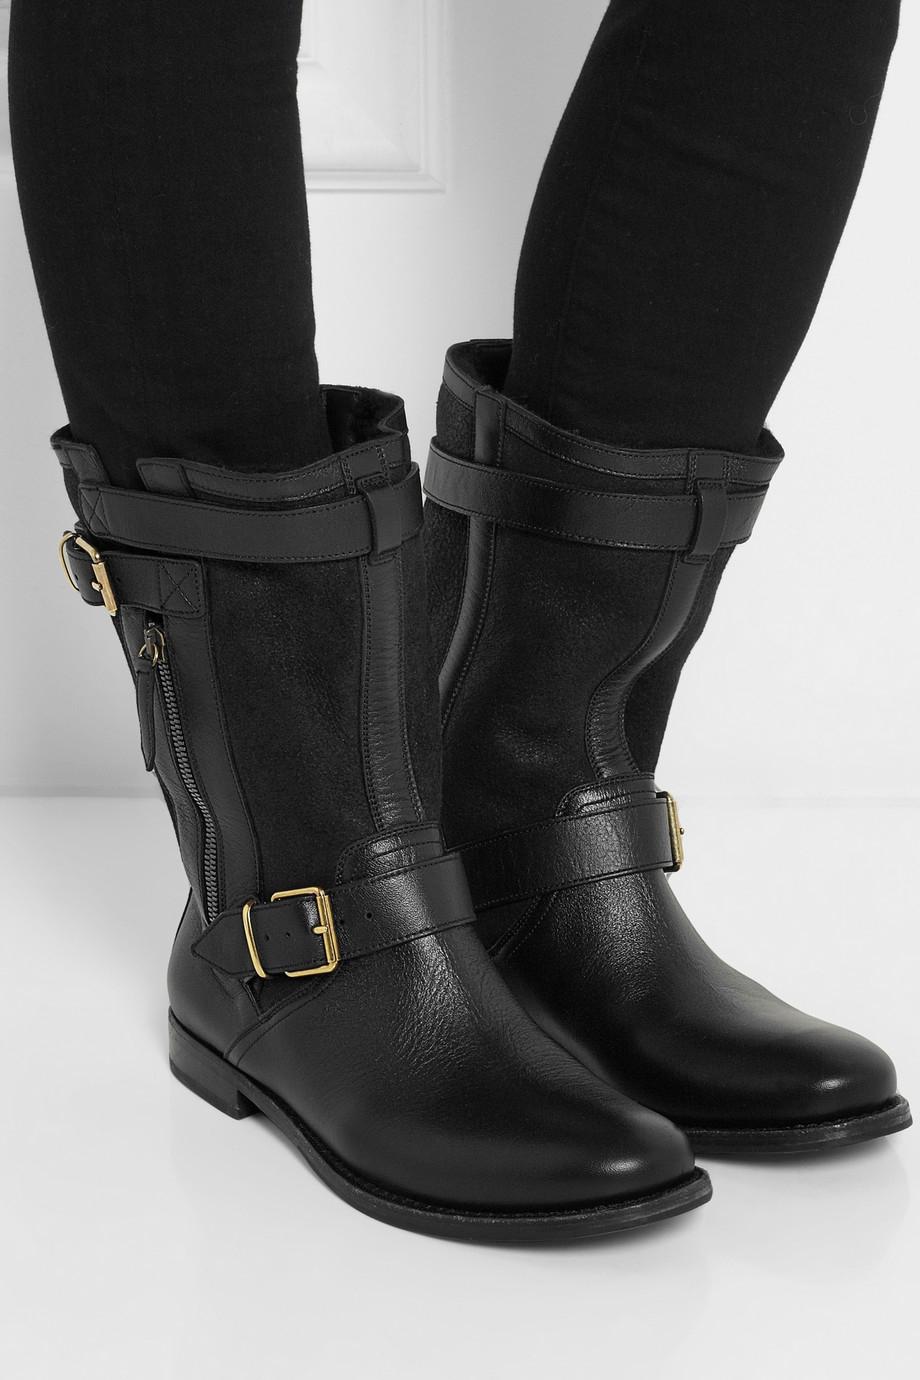 Burberry Leather Biker Boots vUwUhOozAX